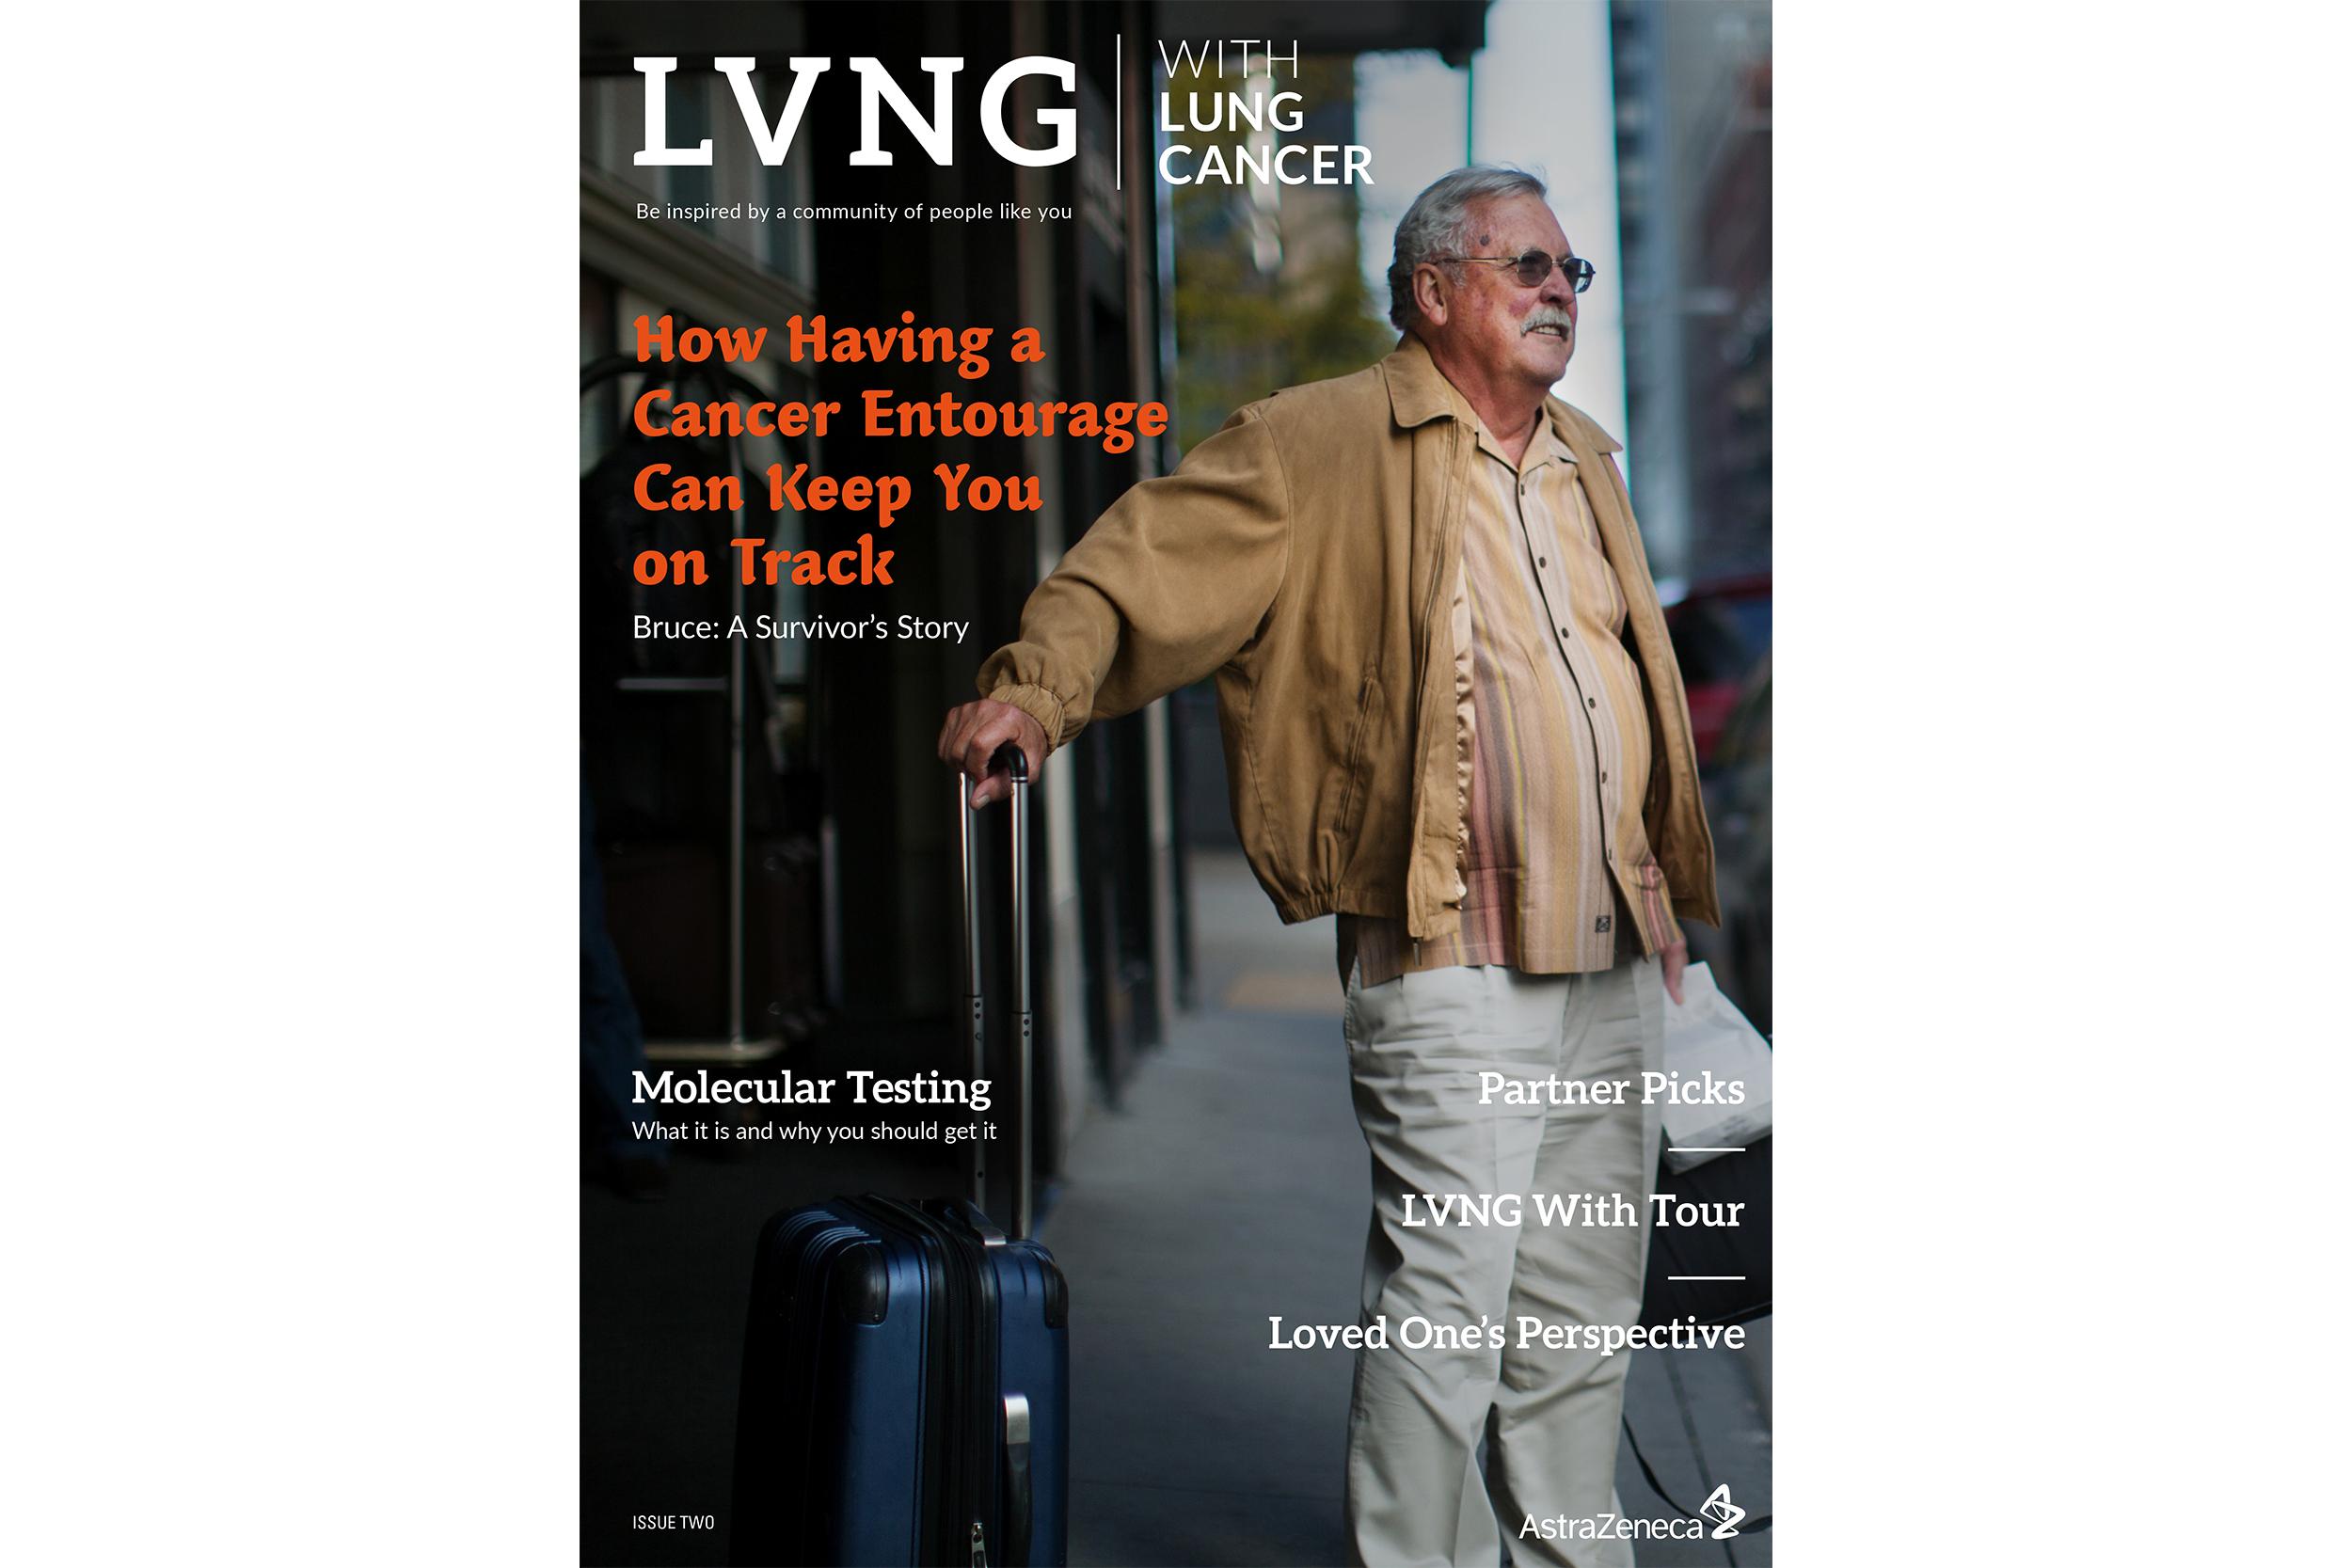 LVNG_NP_Issue2_1.19.16_AA-1.jpg